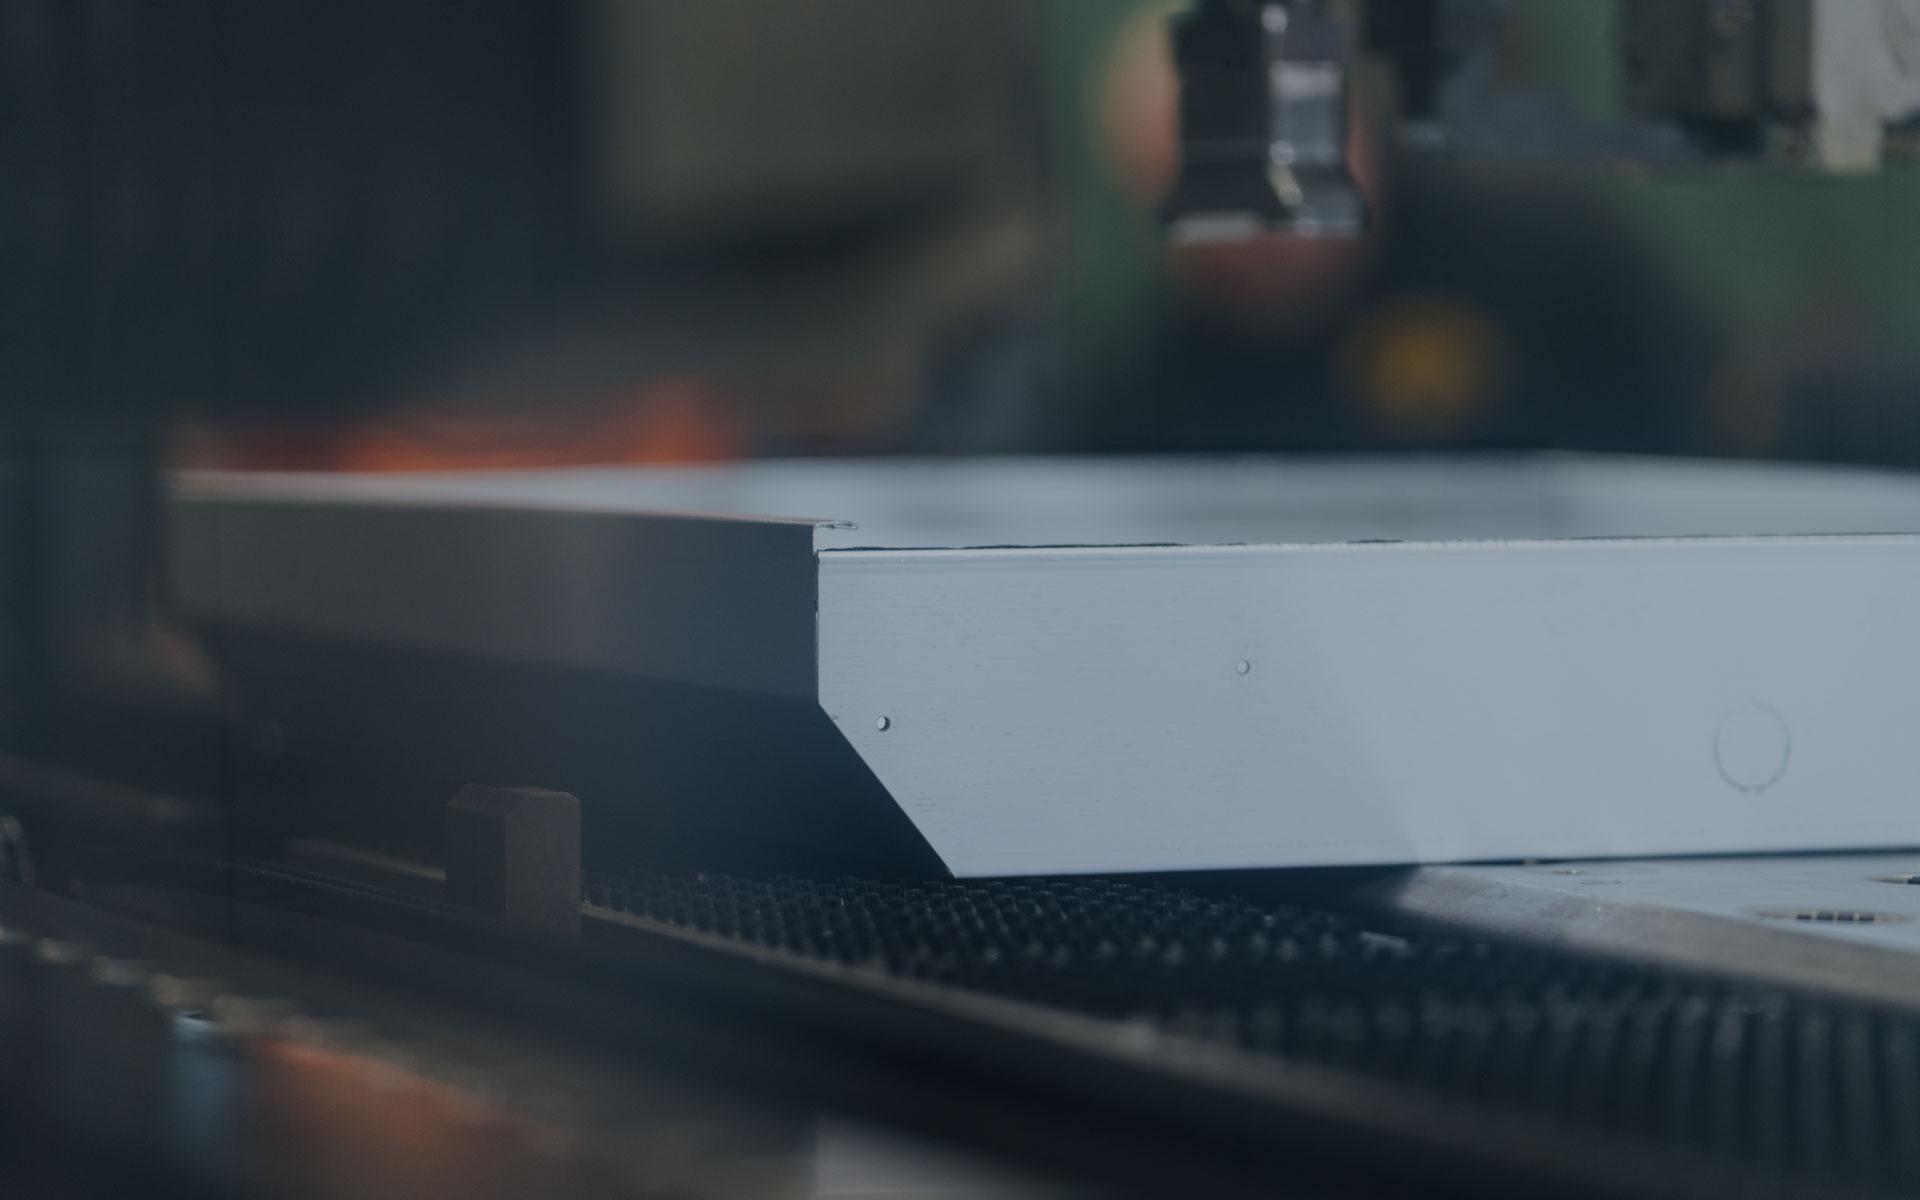 Giese Lighting worker manufacturing an LED light fixture